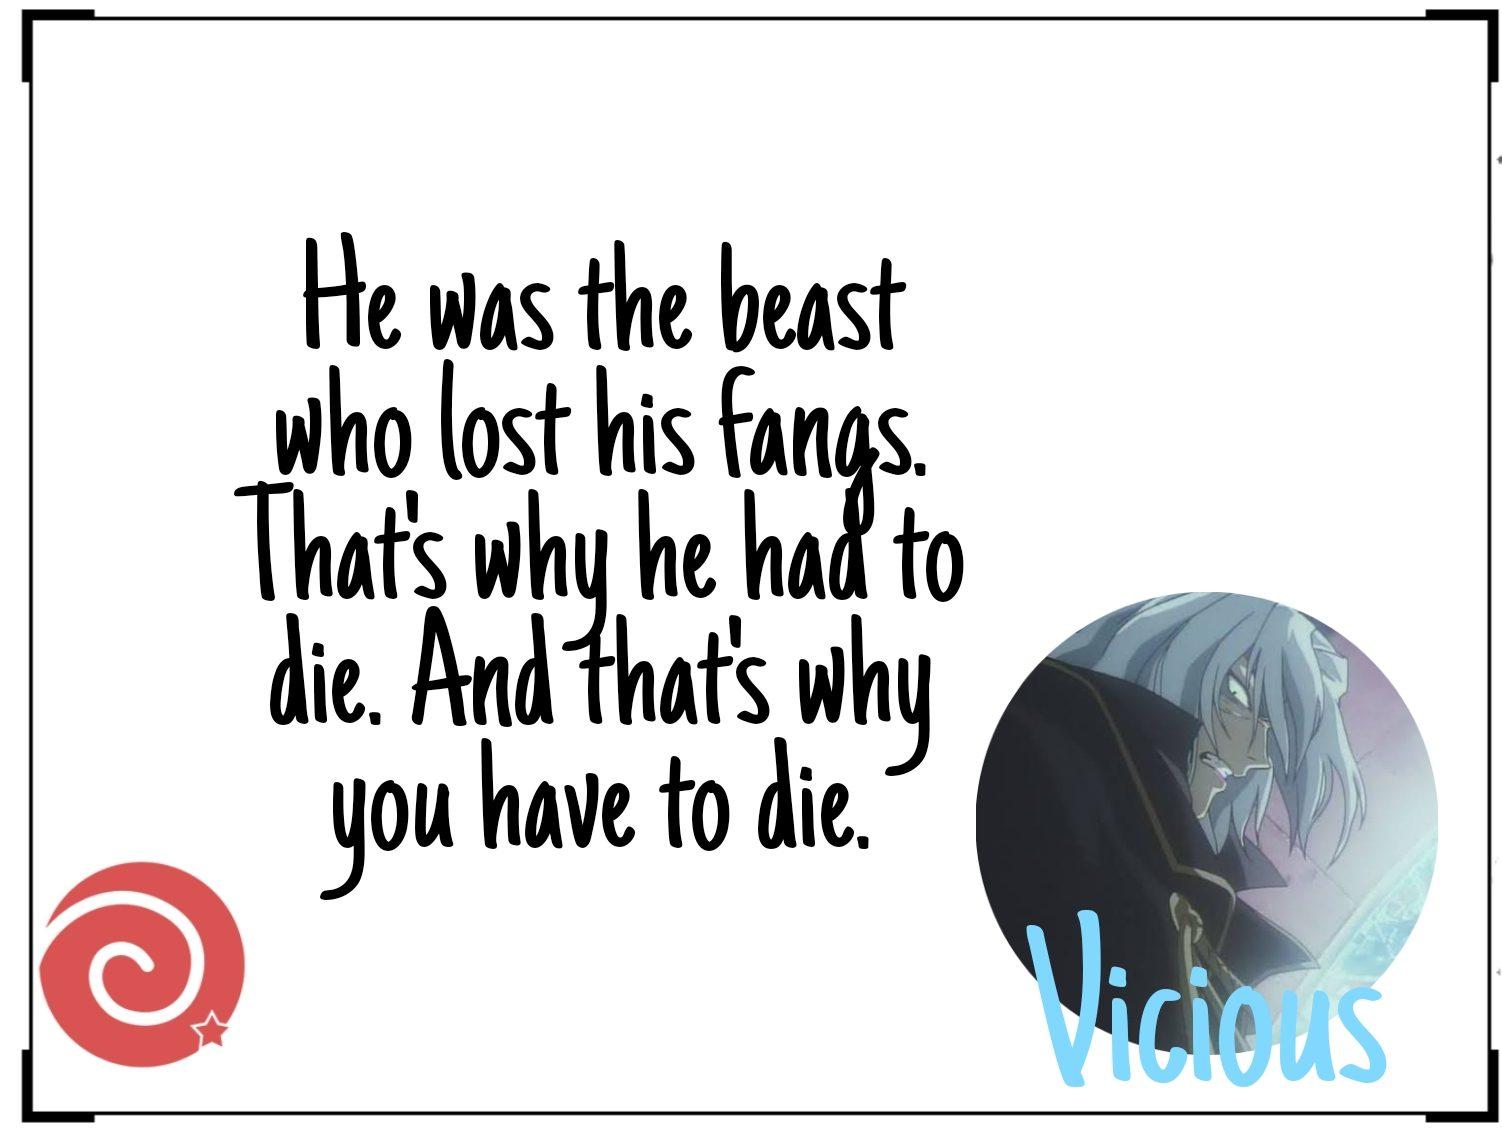 Vicious quotes from Cowboy Bebop